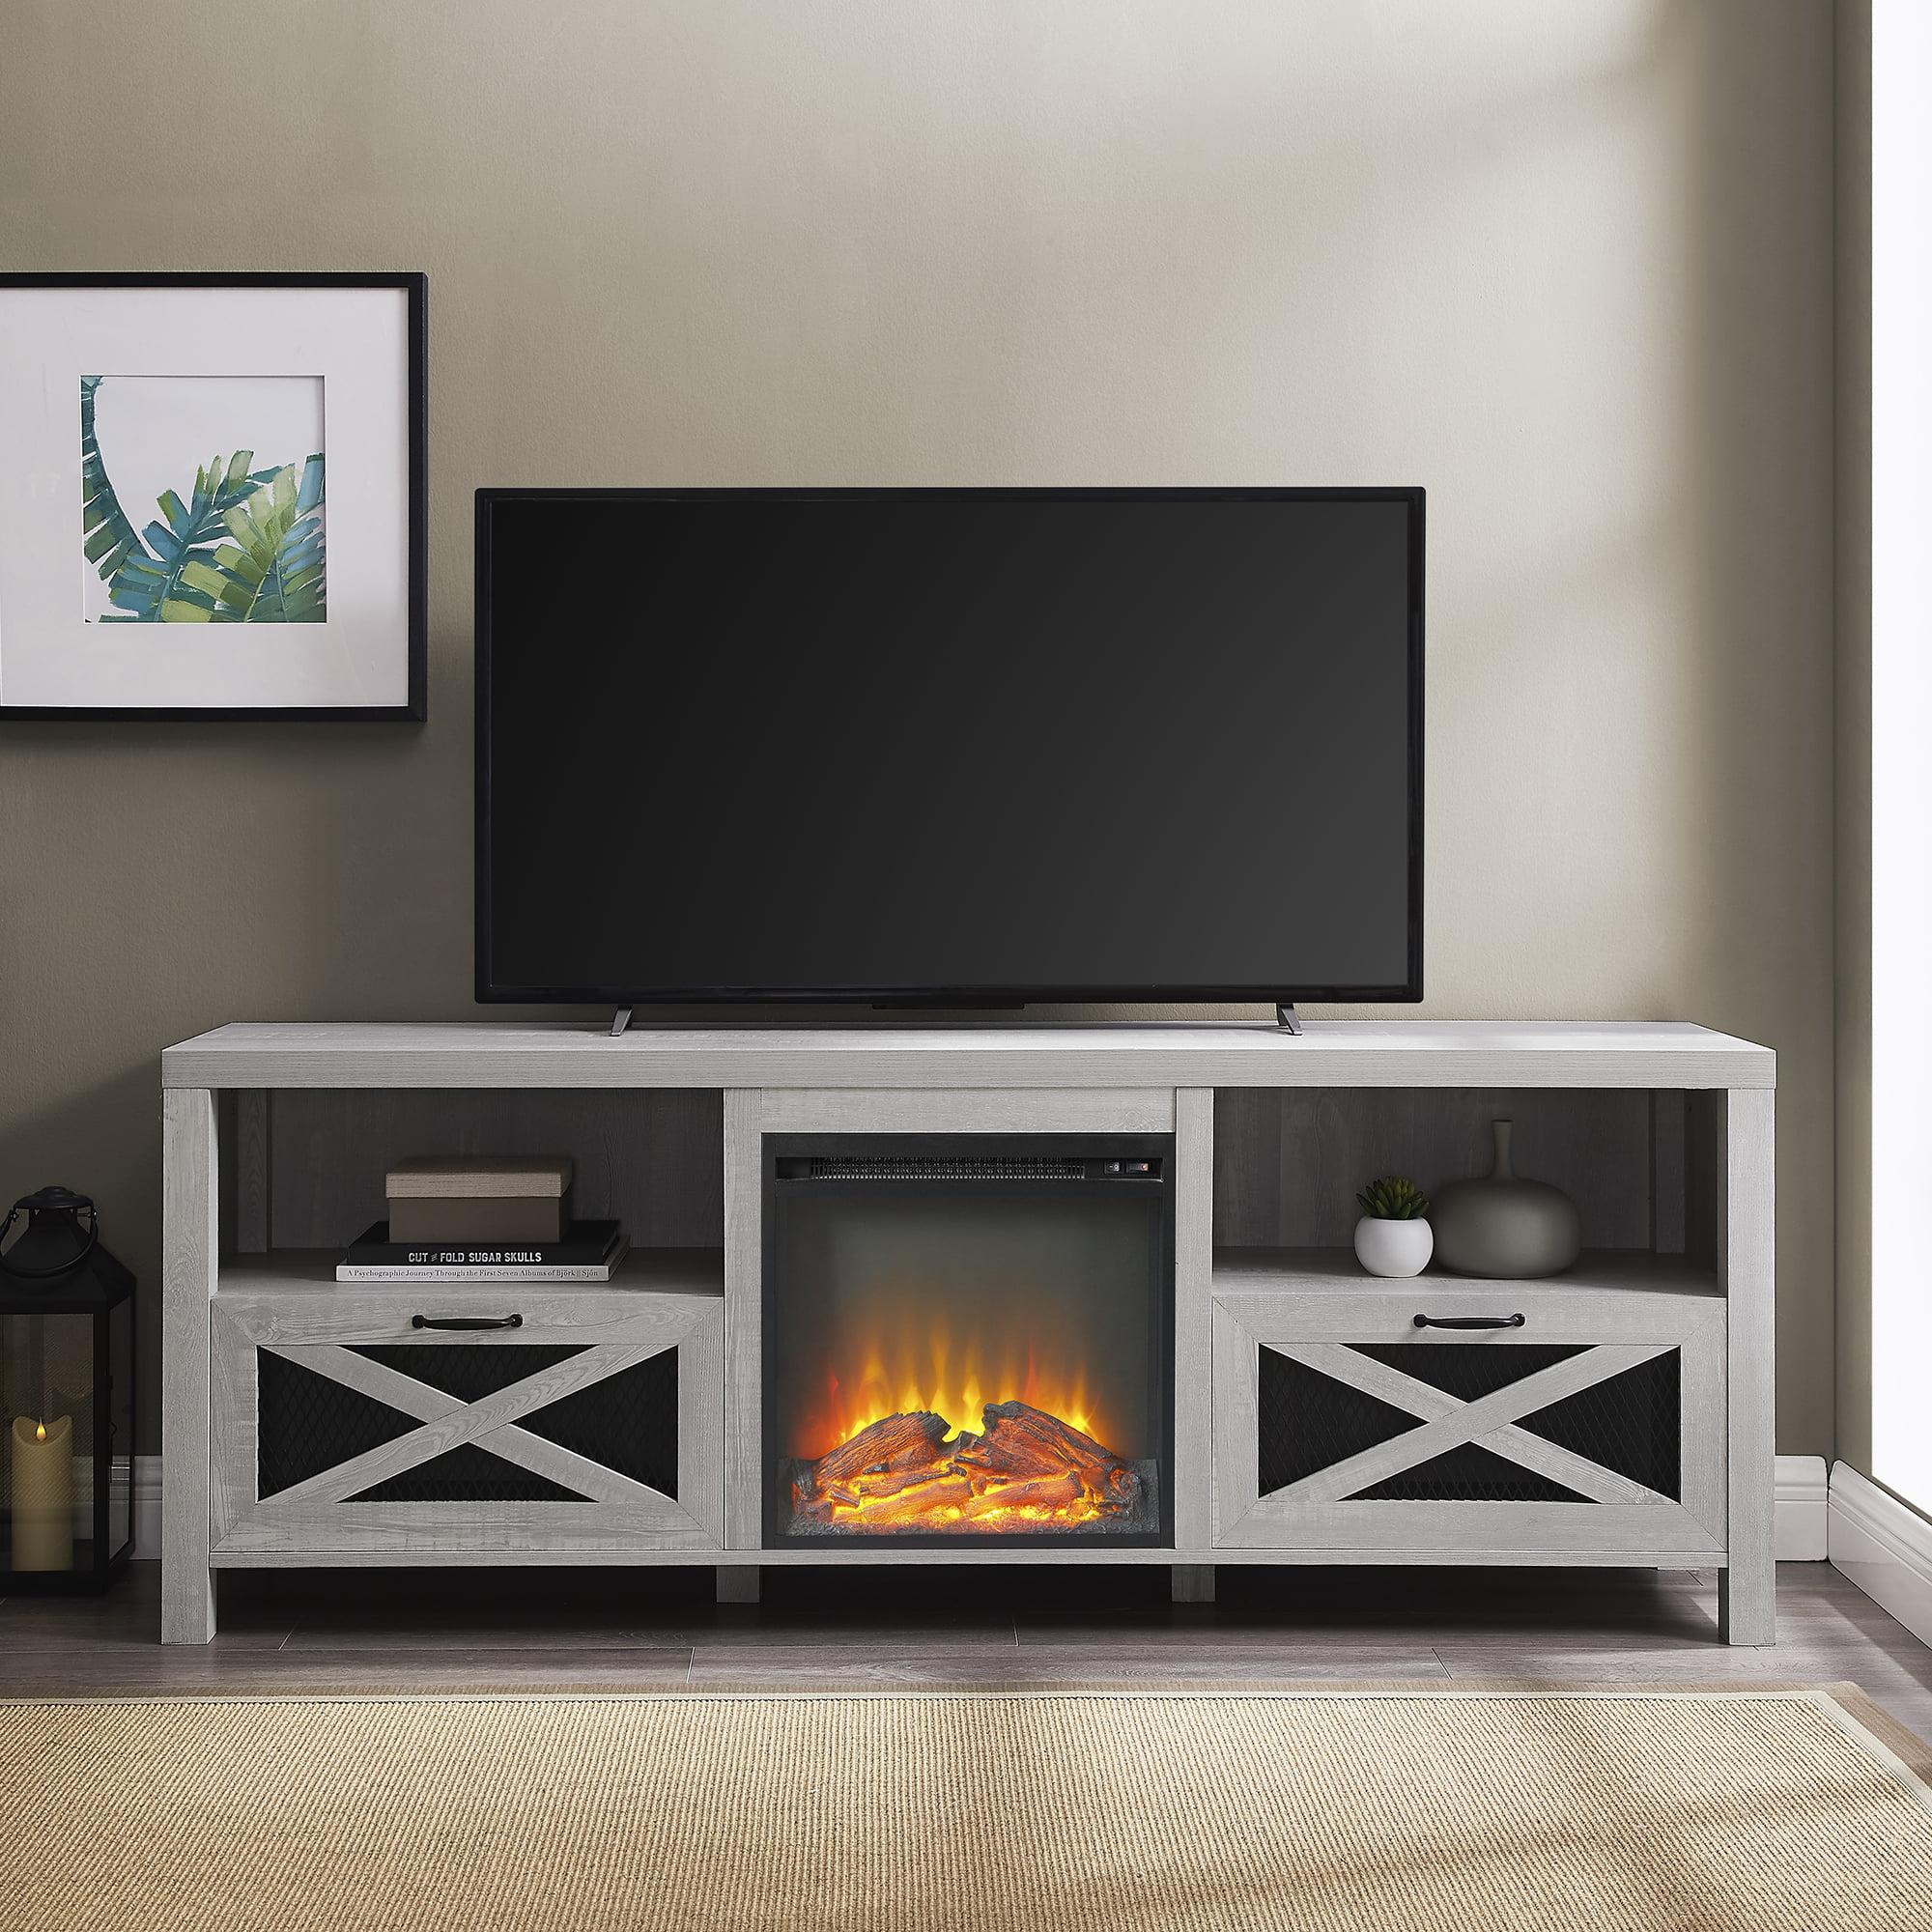 Manor Park Rustic Fireplace Tv Stand For Tvs Up To 78 Stone Grey Walmart Com Walmart Com